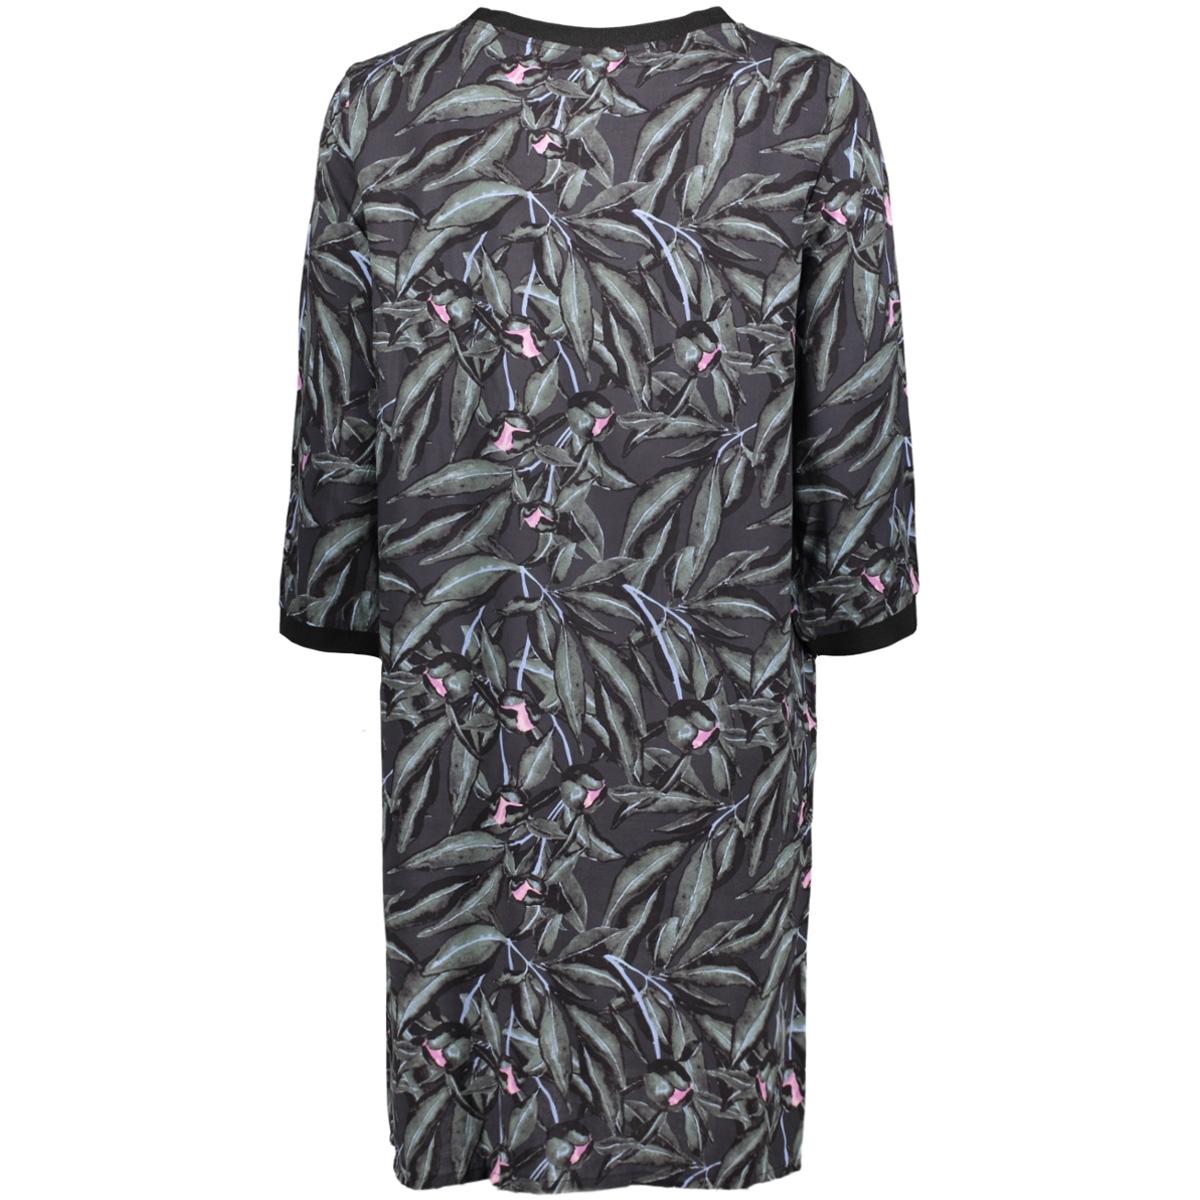 objhaley triny 3/4 dress pb3 23026692 object jurk black/black aop